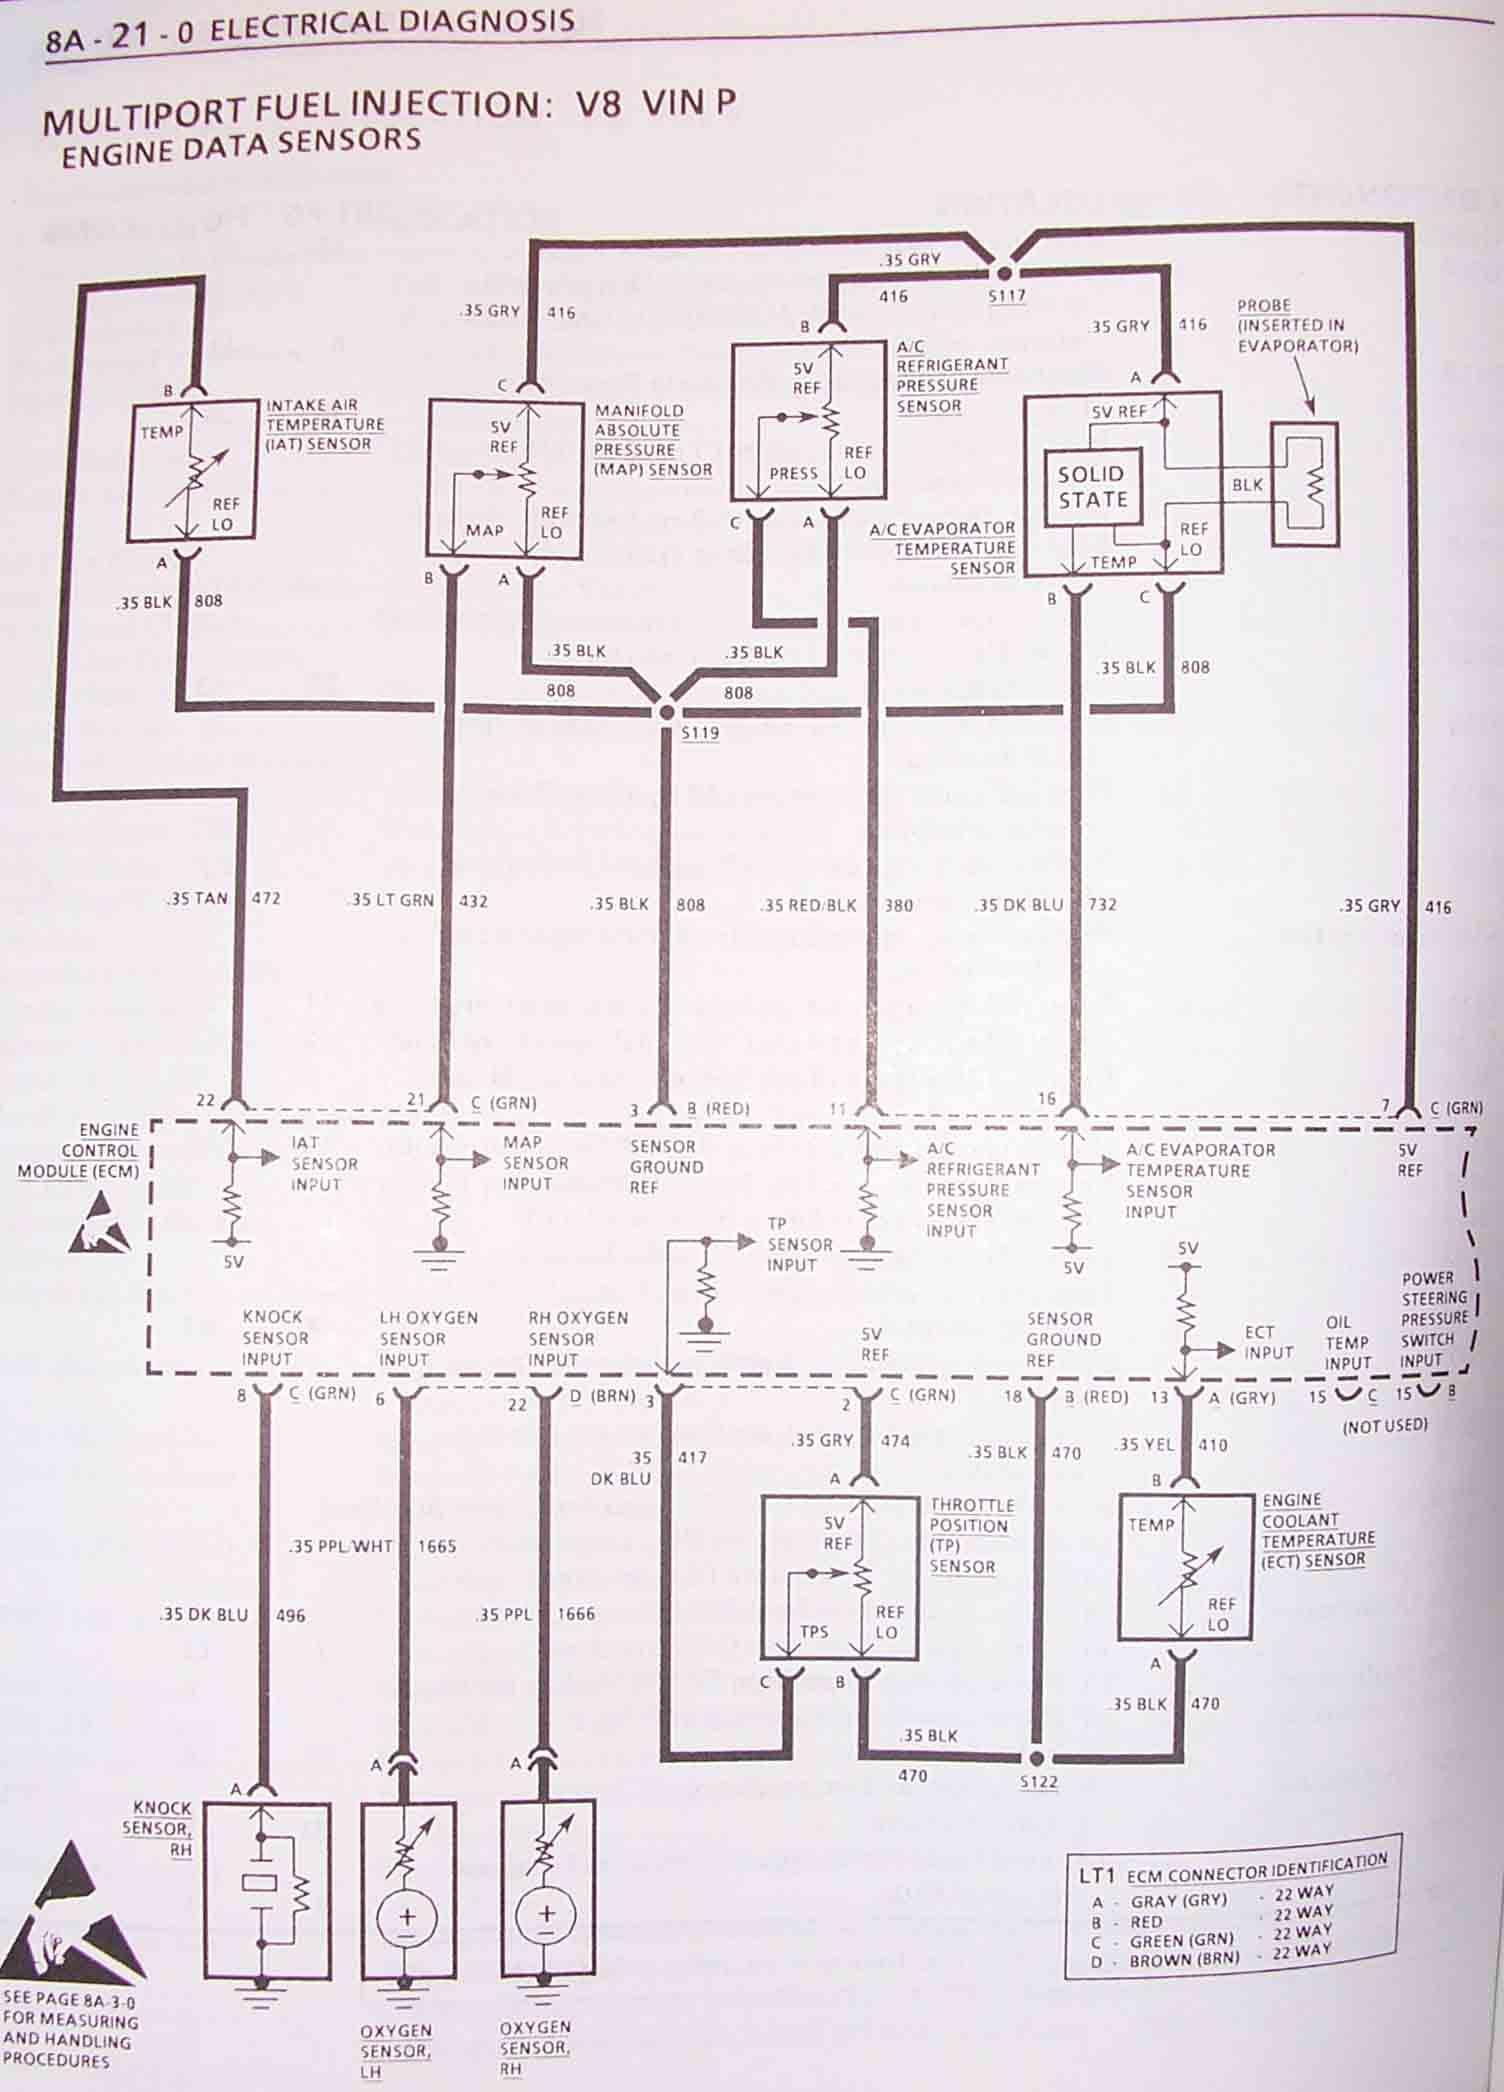 1993 Camaro Lt1 Wiring Harness Information Engine Diagram On Abit Data Sensors